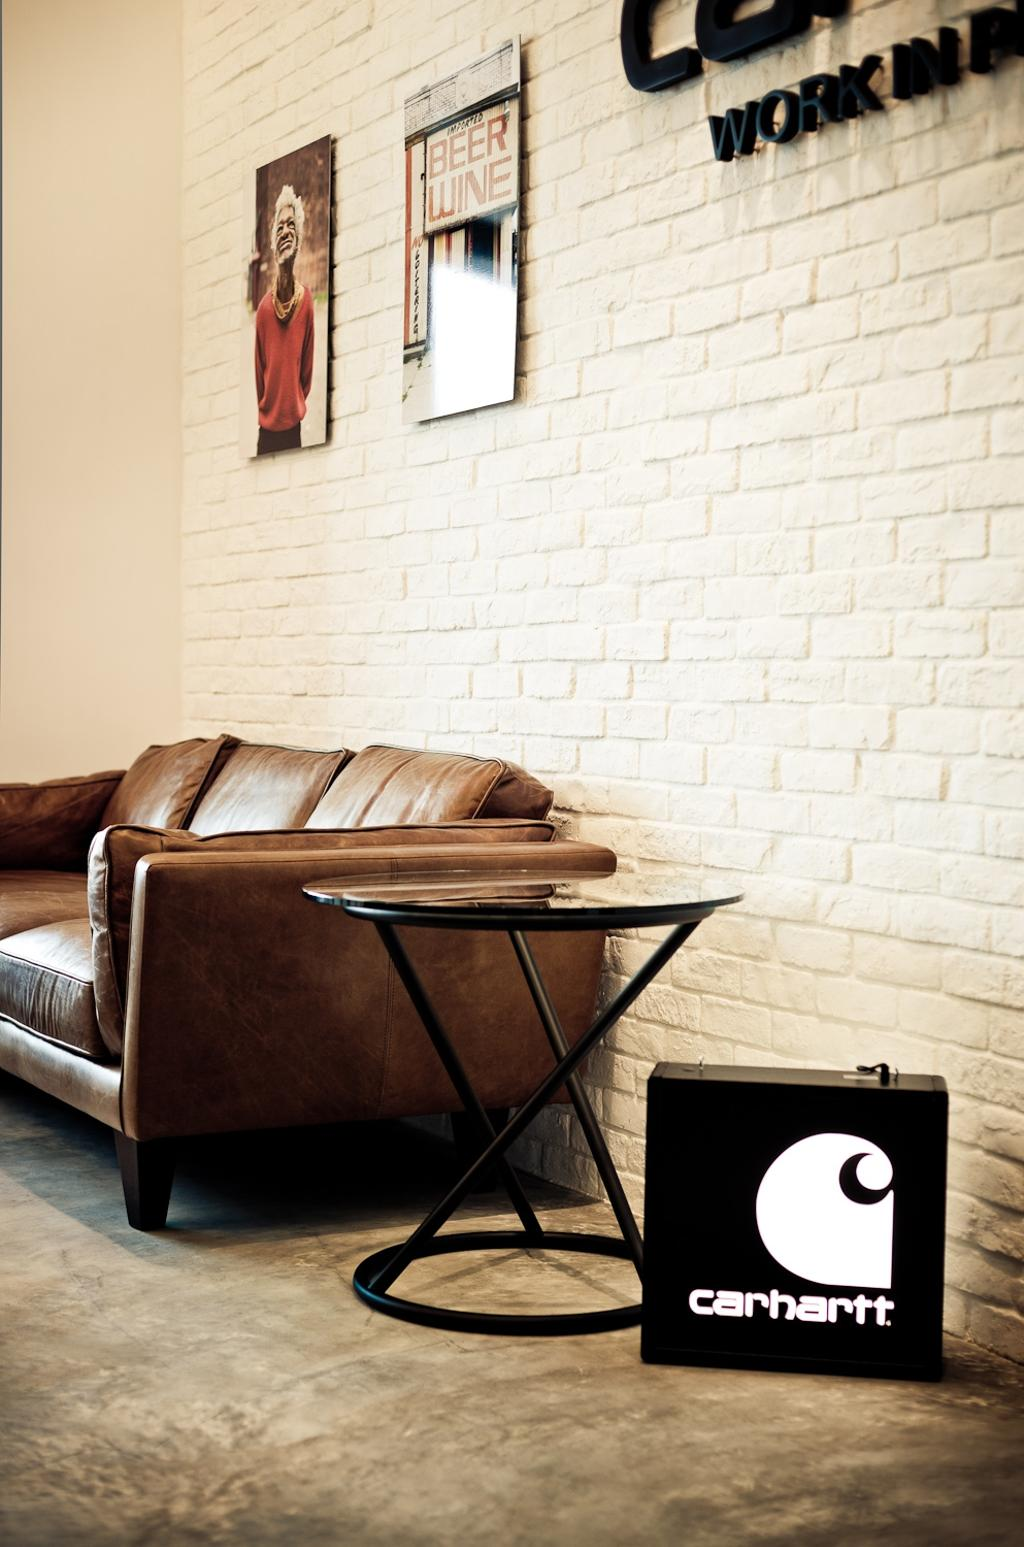 Carhartt WIP, 商用, 室內設計師, Fixonic Interior Design & Construction, 工業, Couch, Furniture, Chair